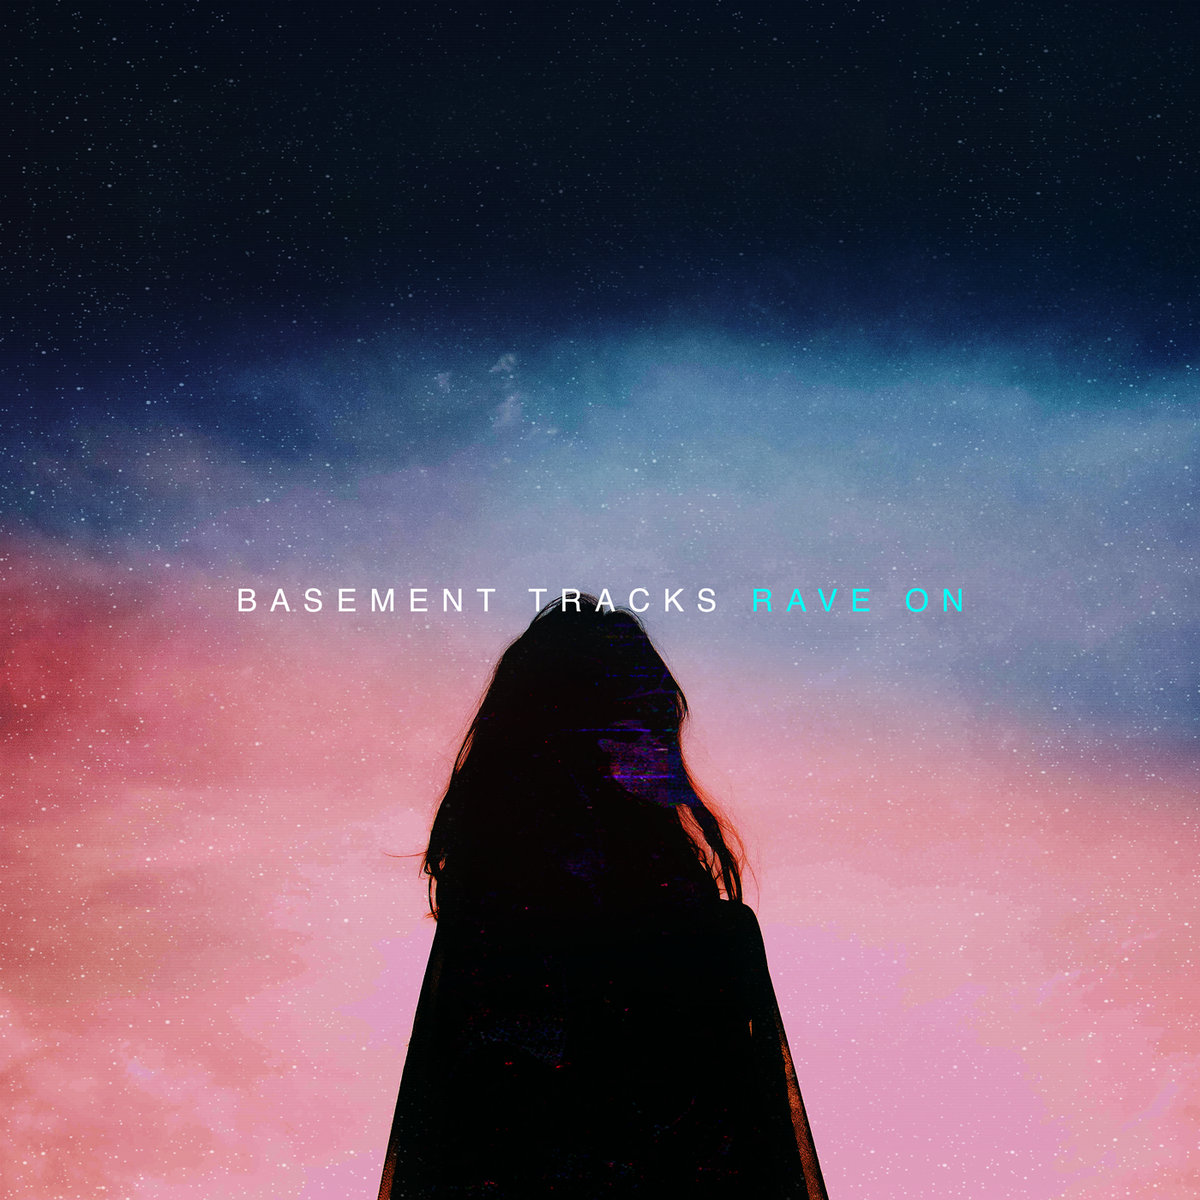 Basement Tracks - Rave On